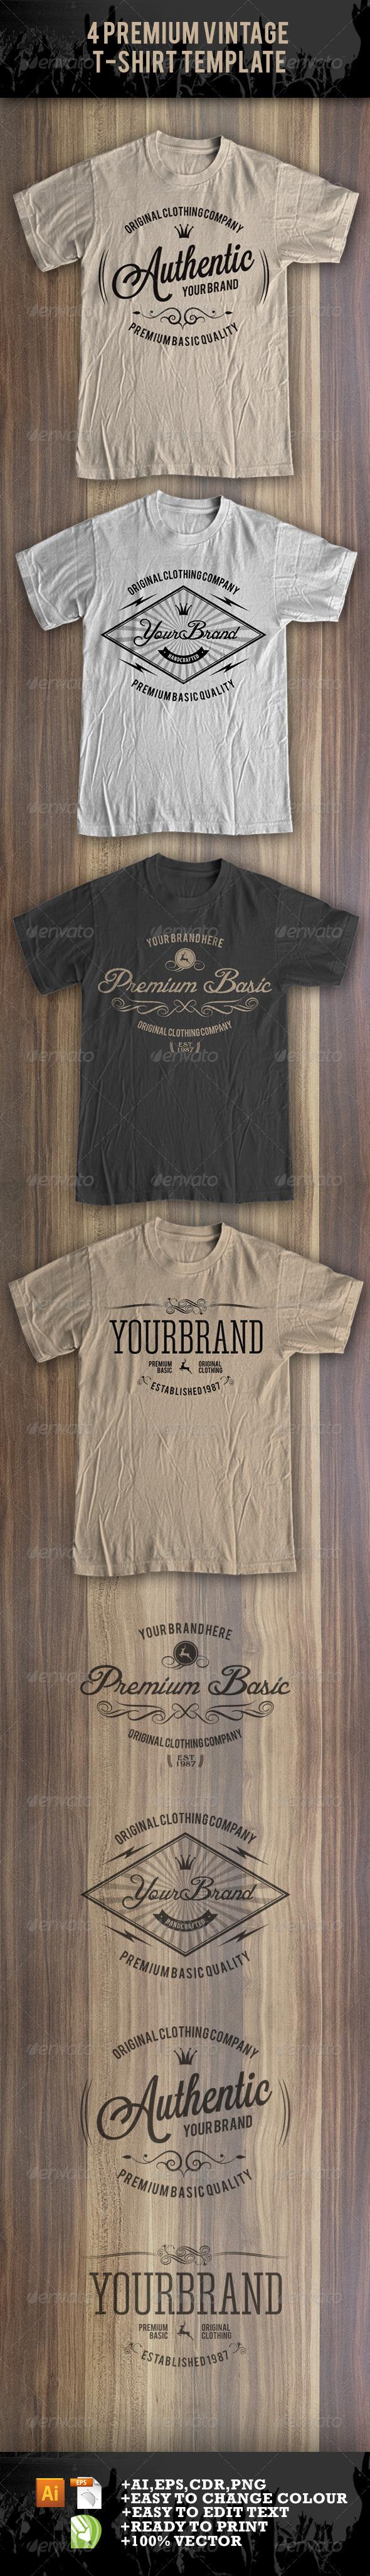 GraphicRiver 4 Premium T-Shirt Template 8369029